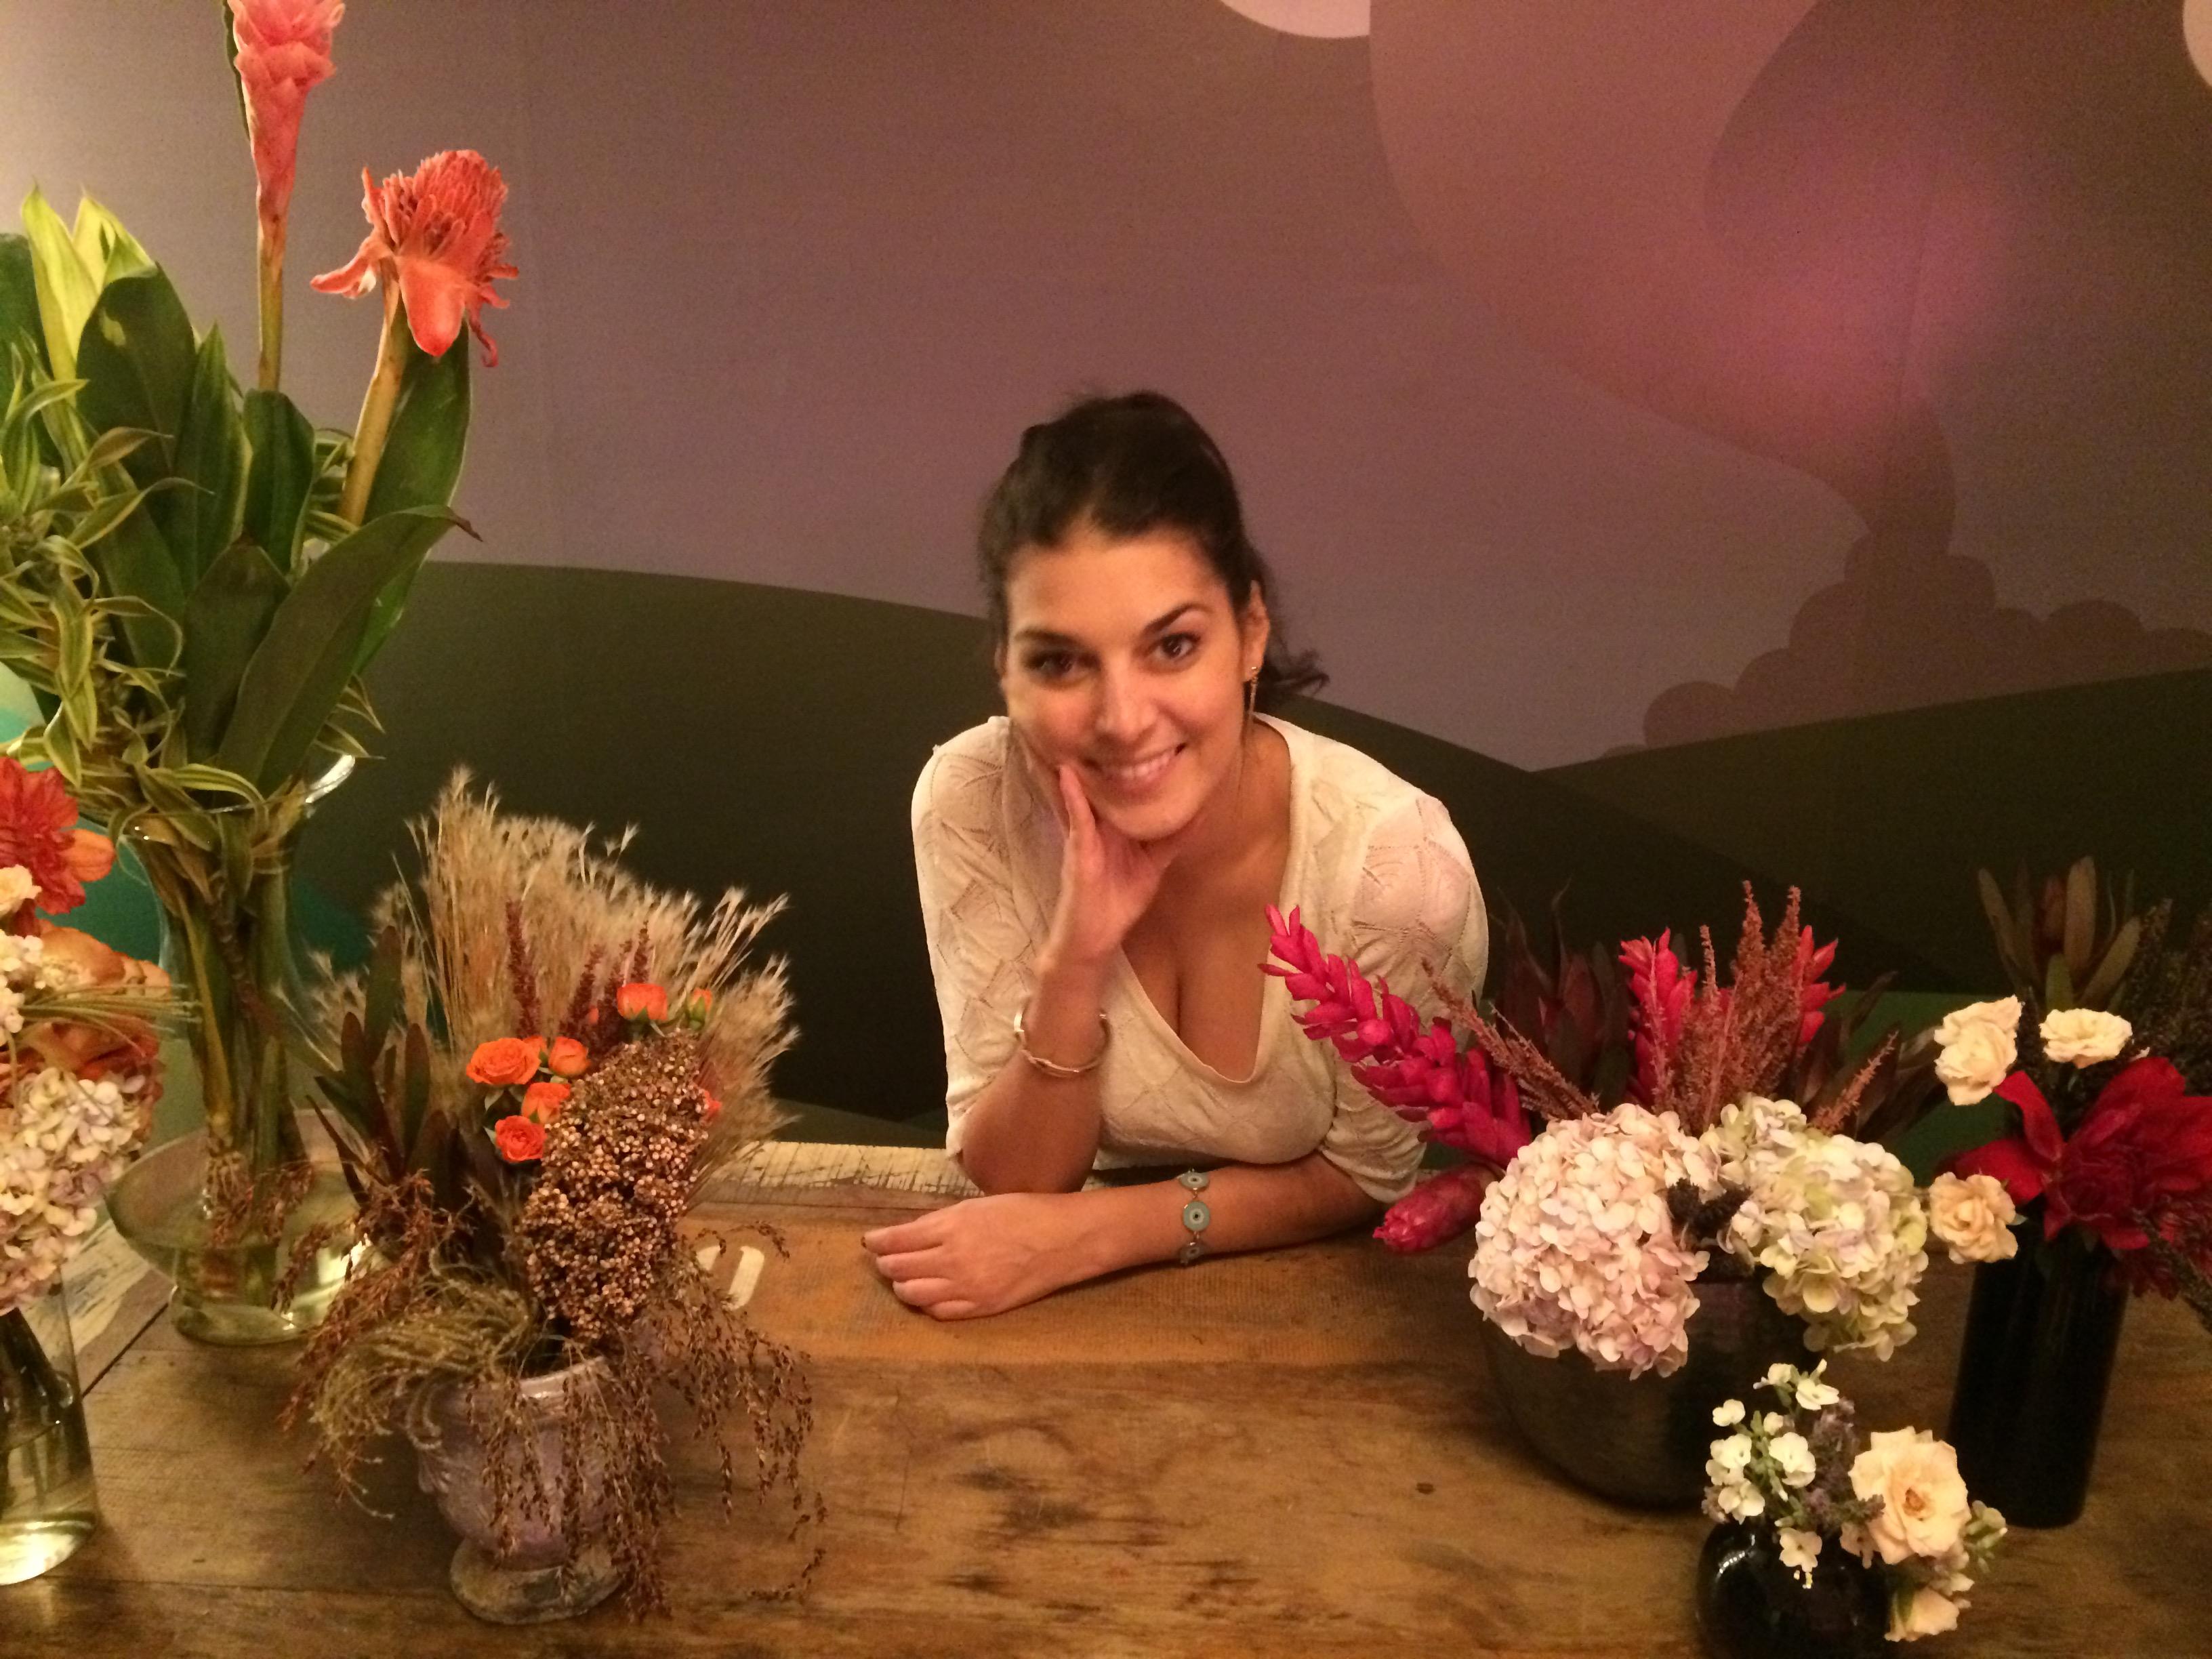 A Florista